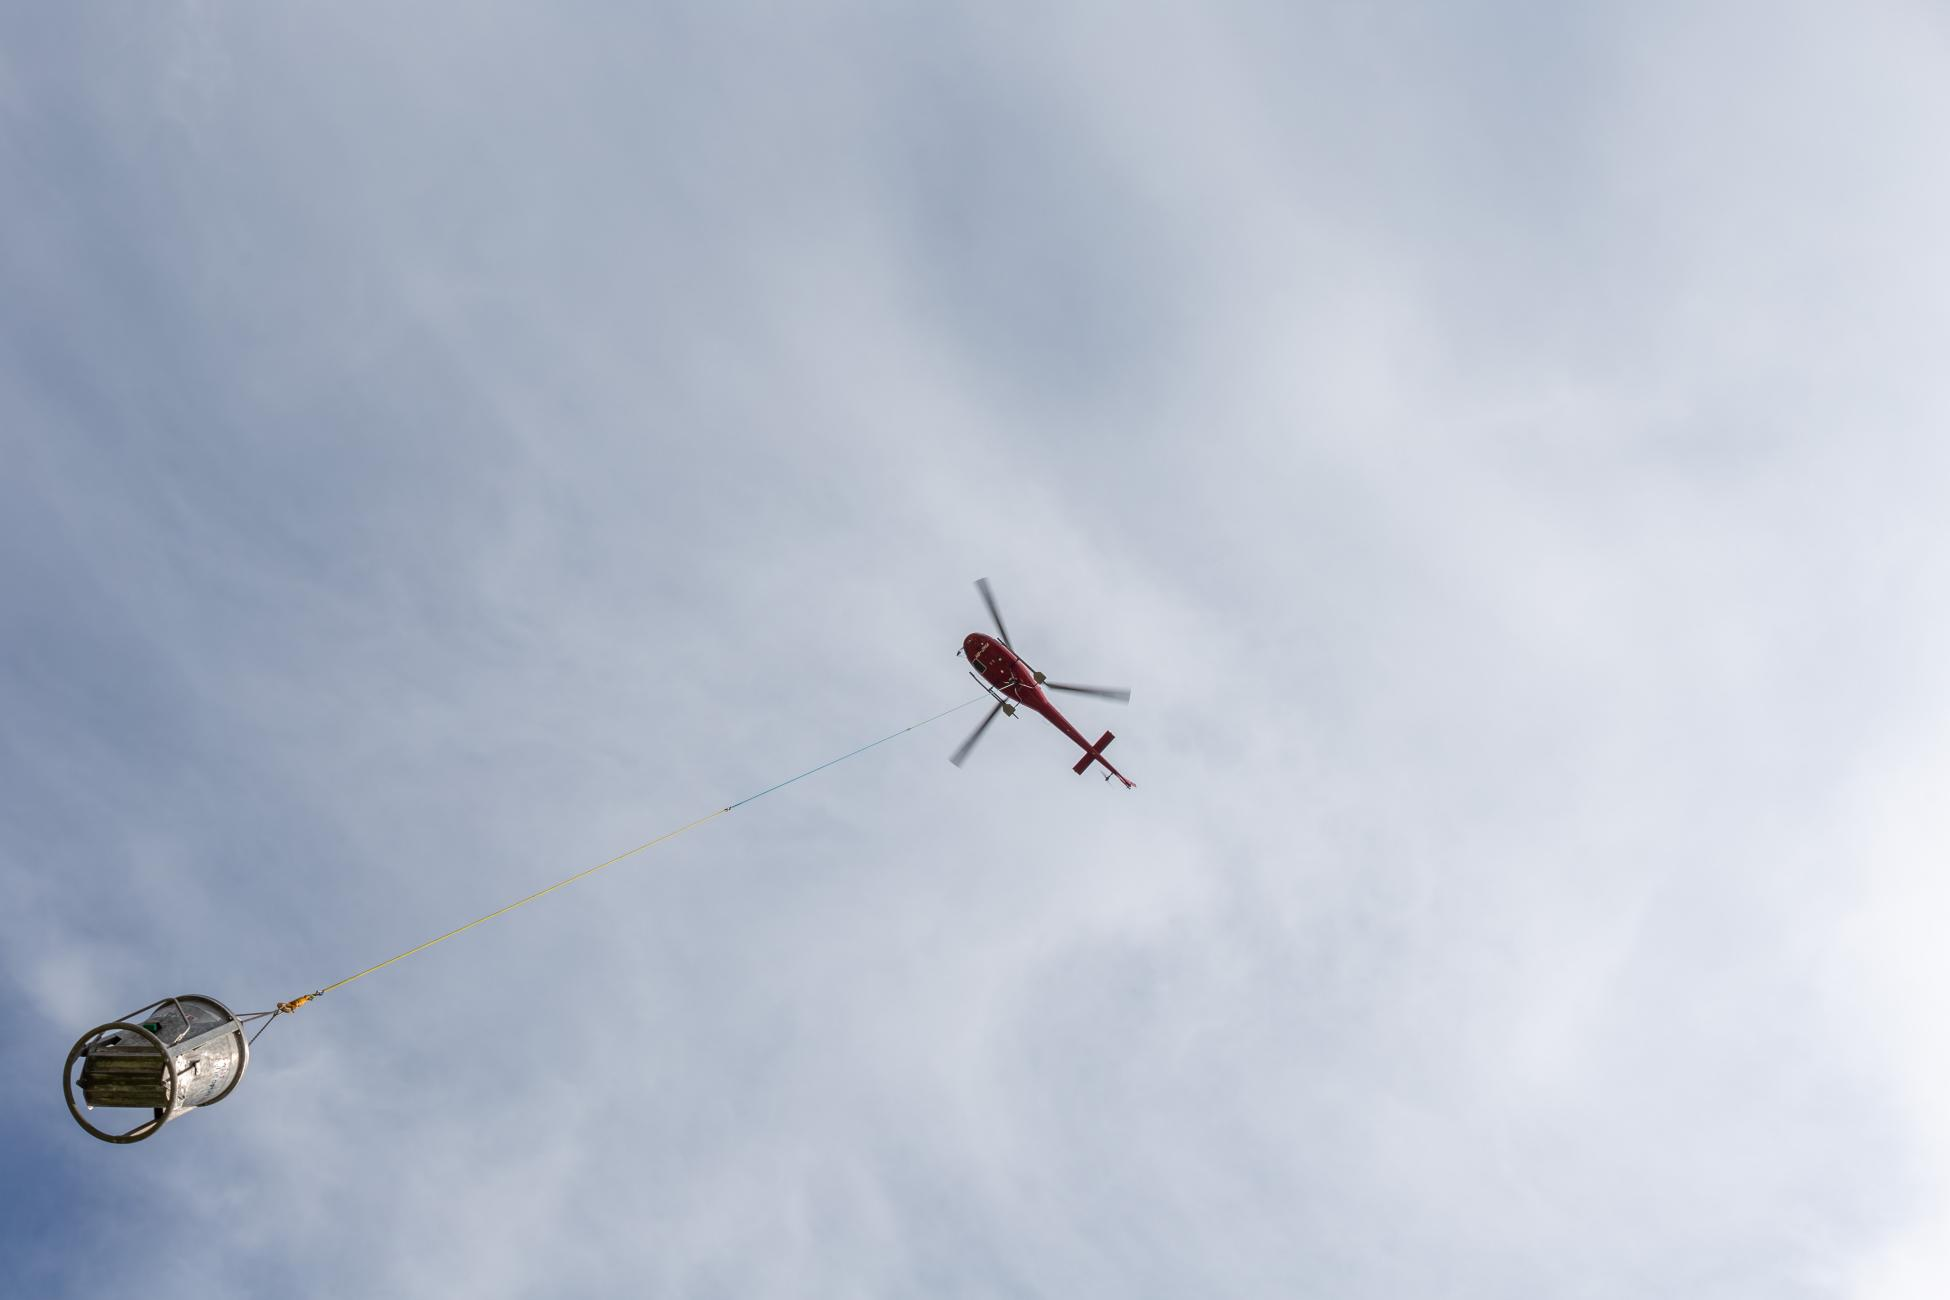 Brugg Wasserleitungsbruch Helikopter Transport